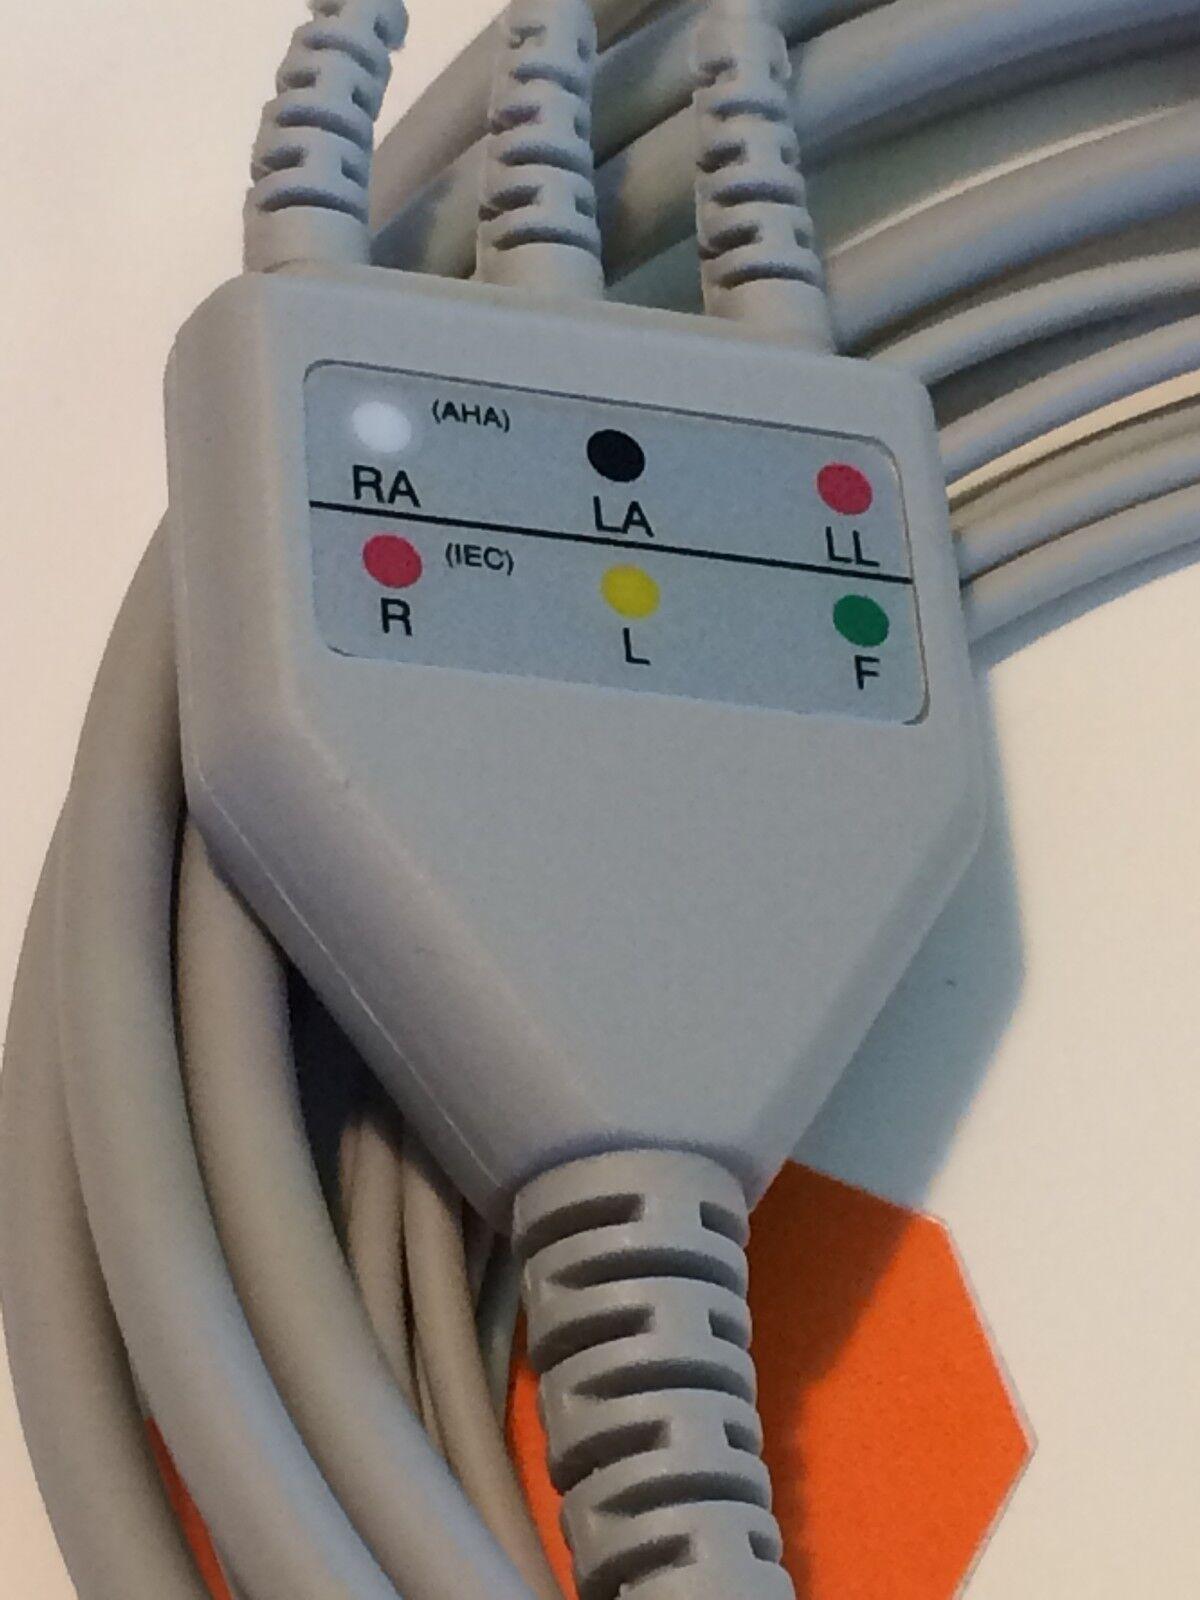 NEW EKG ECG 6PIN 3LEAD AHA CLIP CABLE, ZOLL E R M PD SERIES, GE DINAMAP CRITIKON MPS